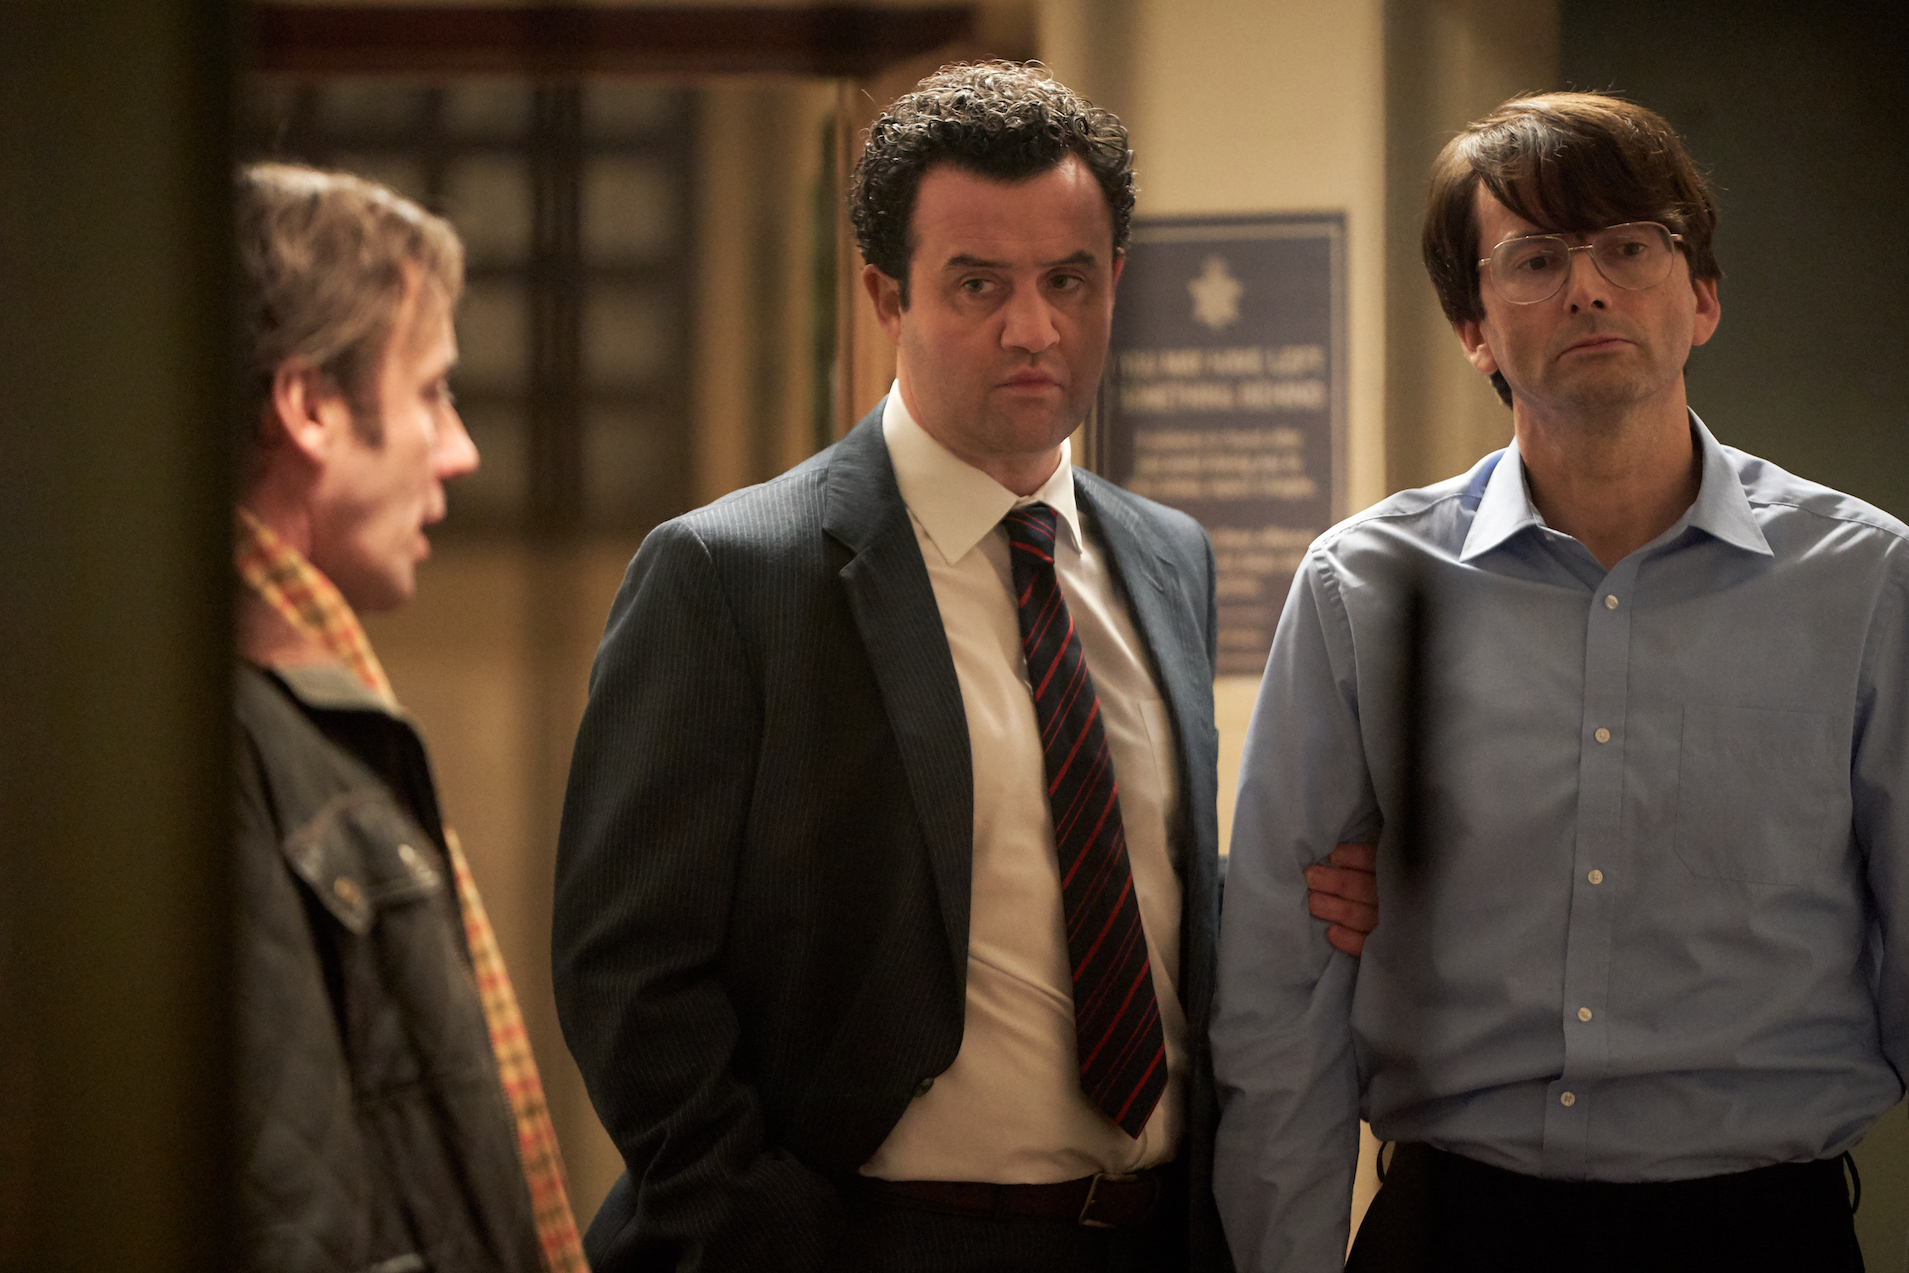 Nilsen com o detetive-chefe inspetor Peter Jay (Line of Duty Daniel Mays) em ITV's Des